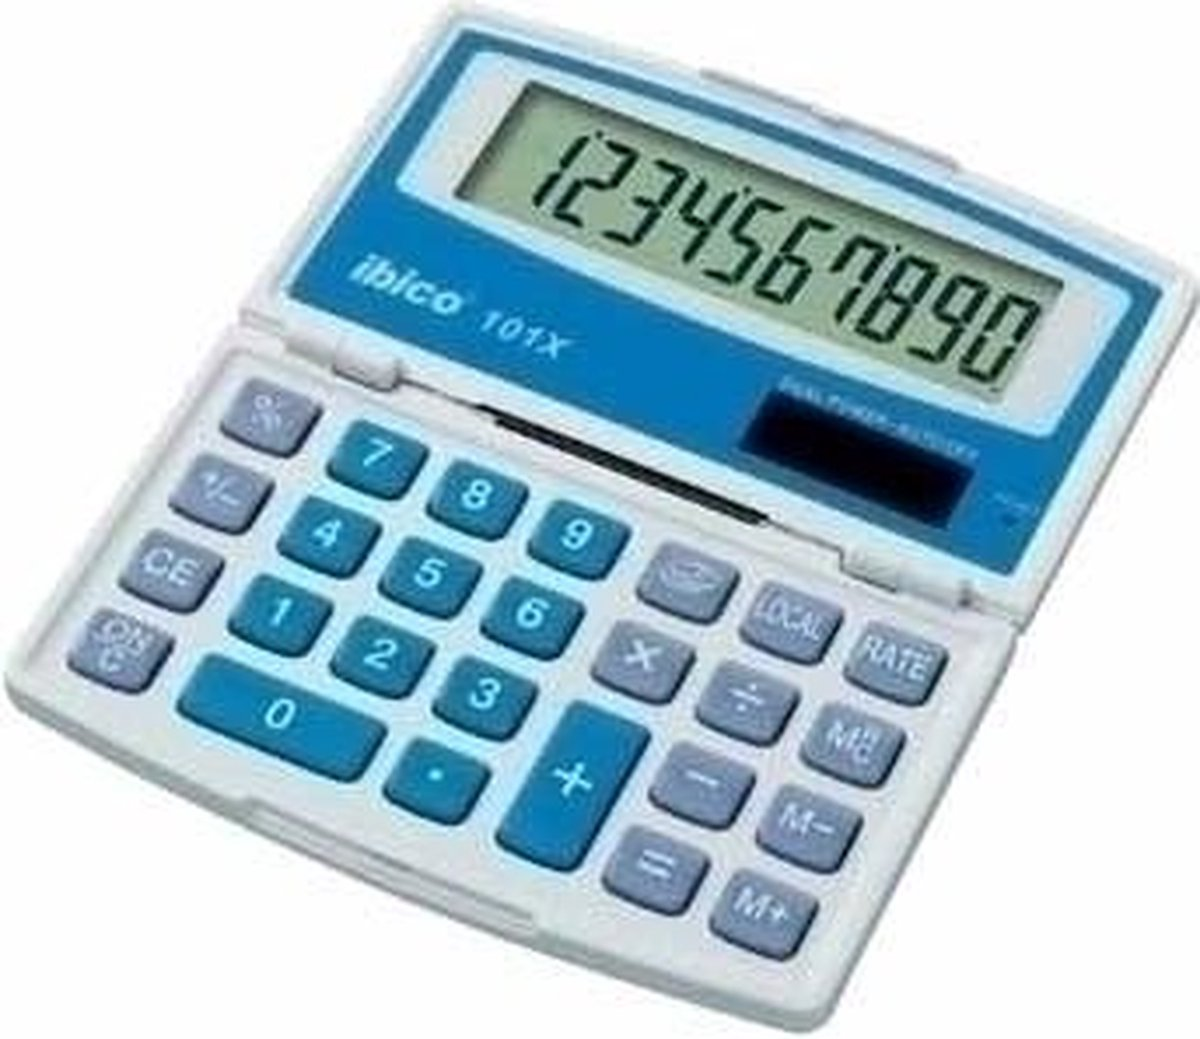 Ibico 101X Pocket Basisrekenmachine calculator